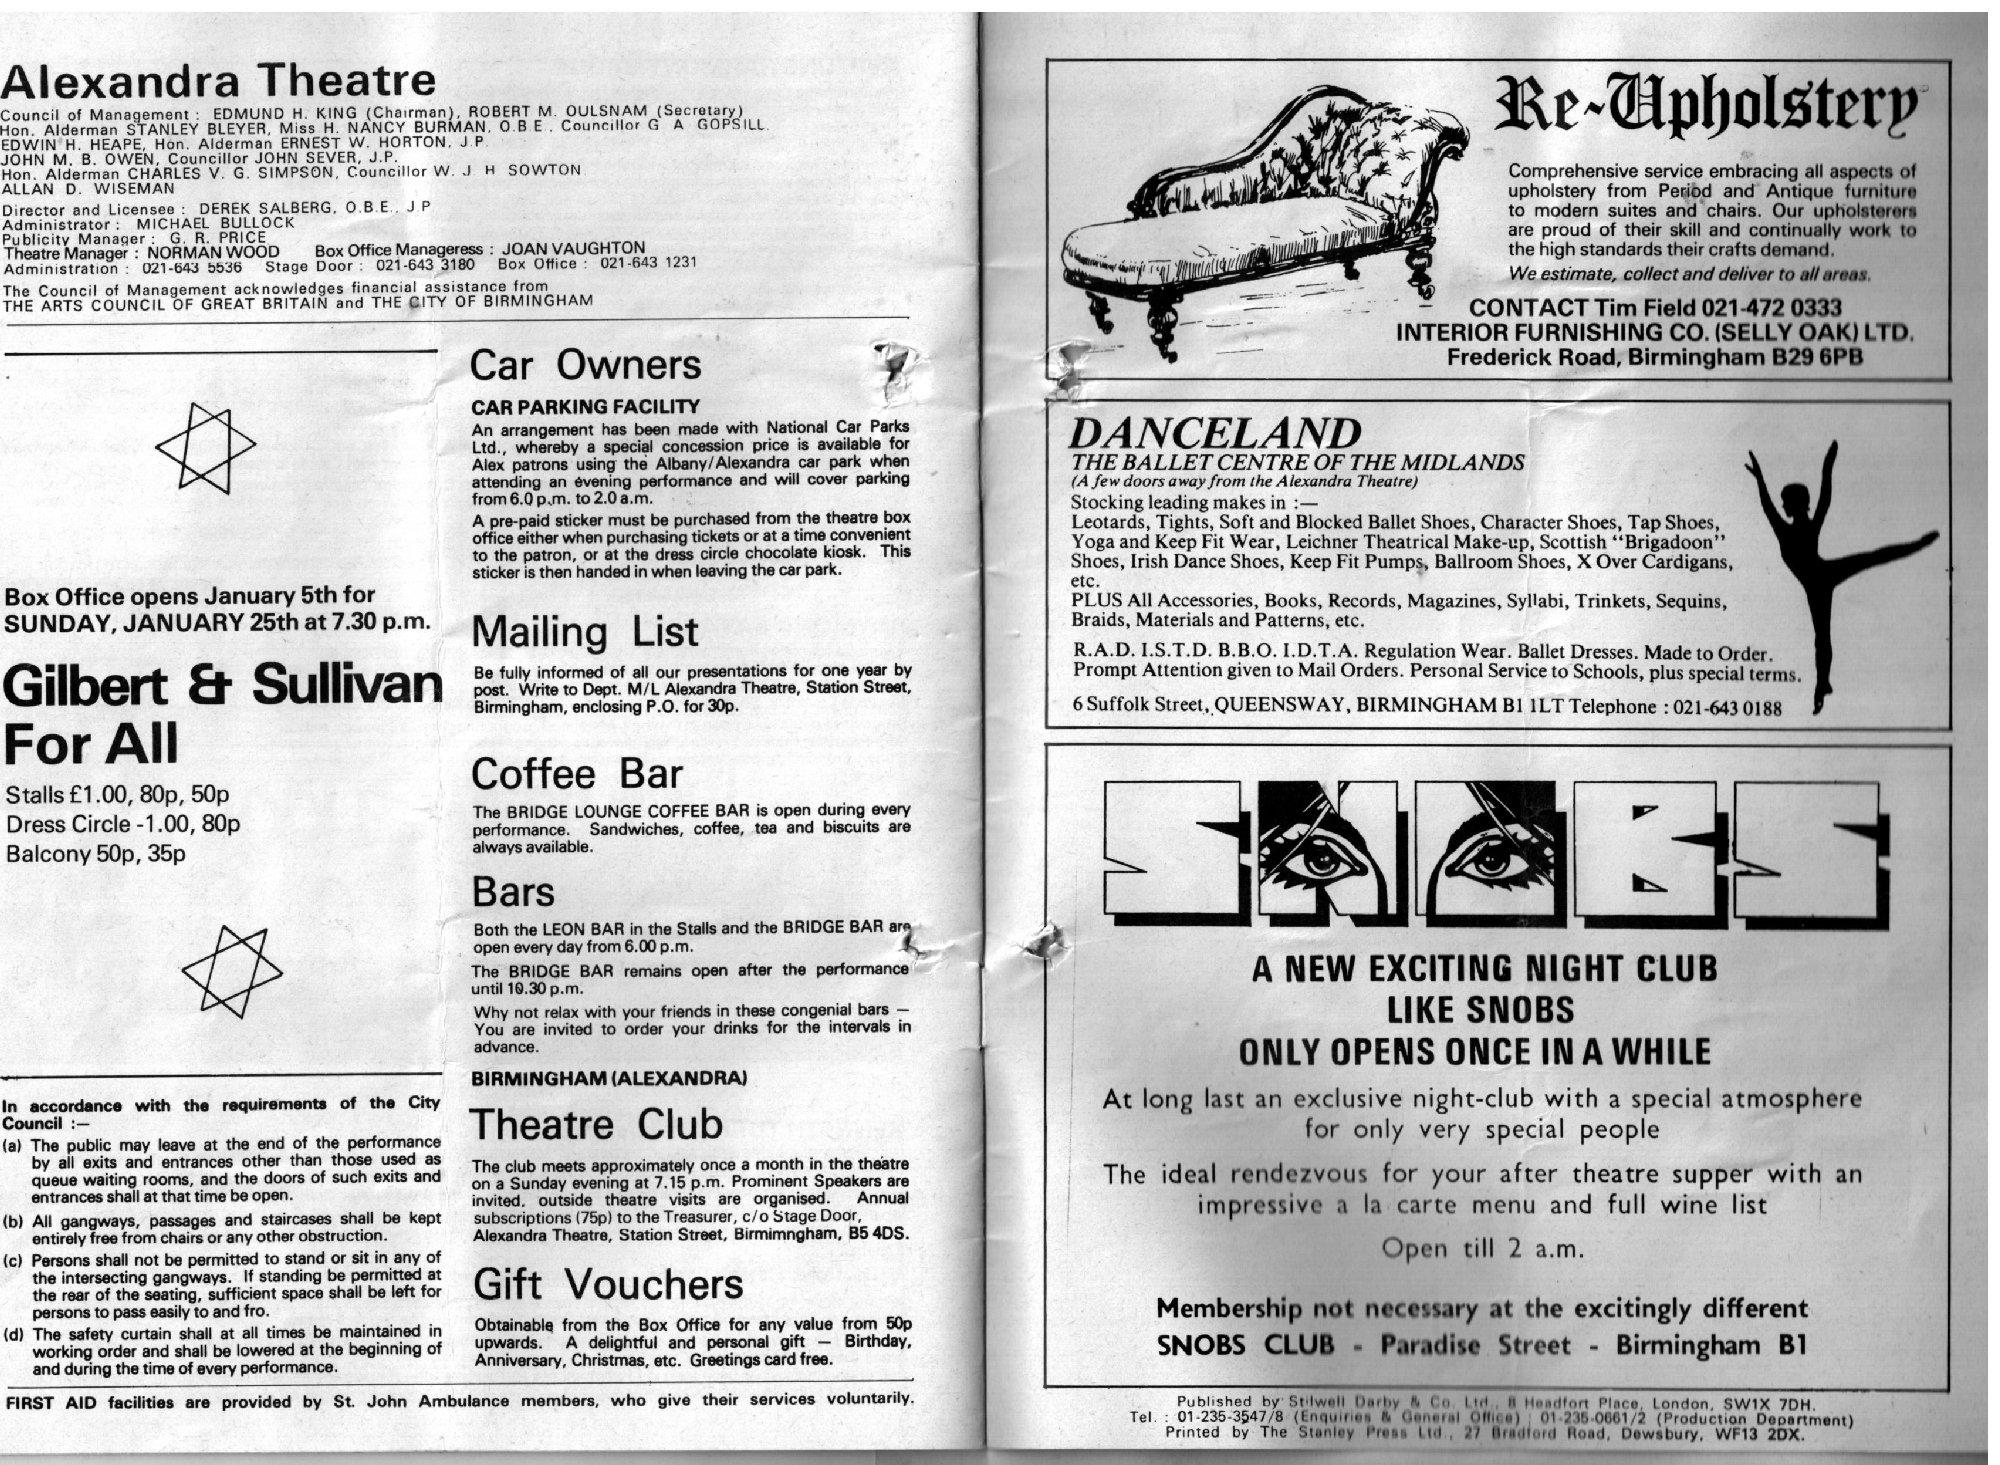 O199h_Alexandra_Theatre-[Cinderella]-[1975-76]